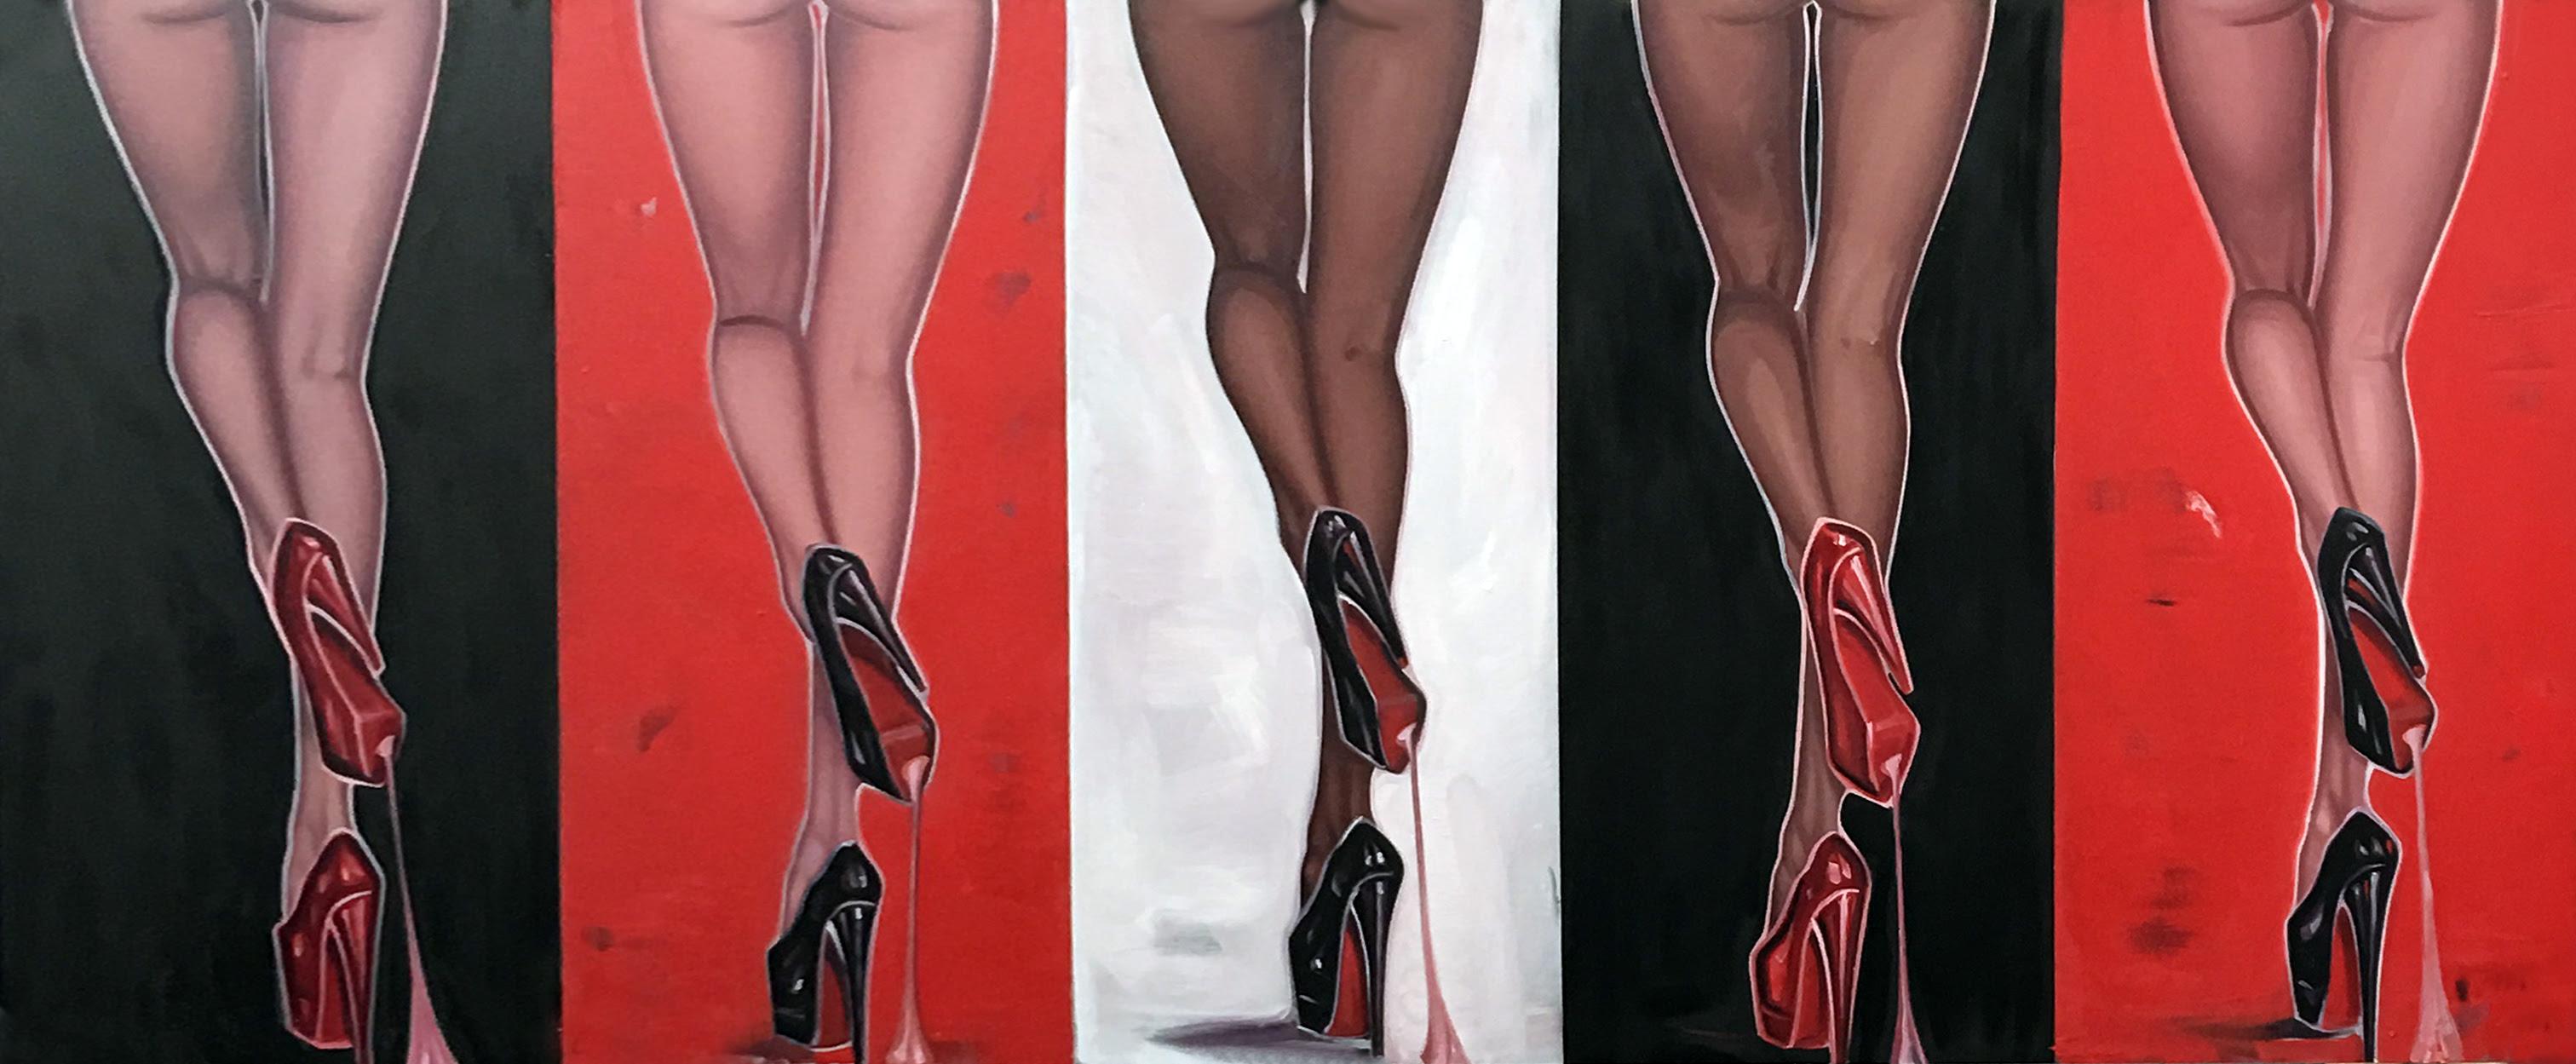 Seeing Legs Angela China